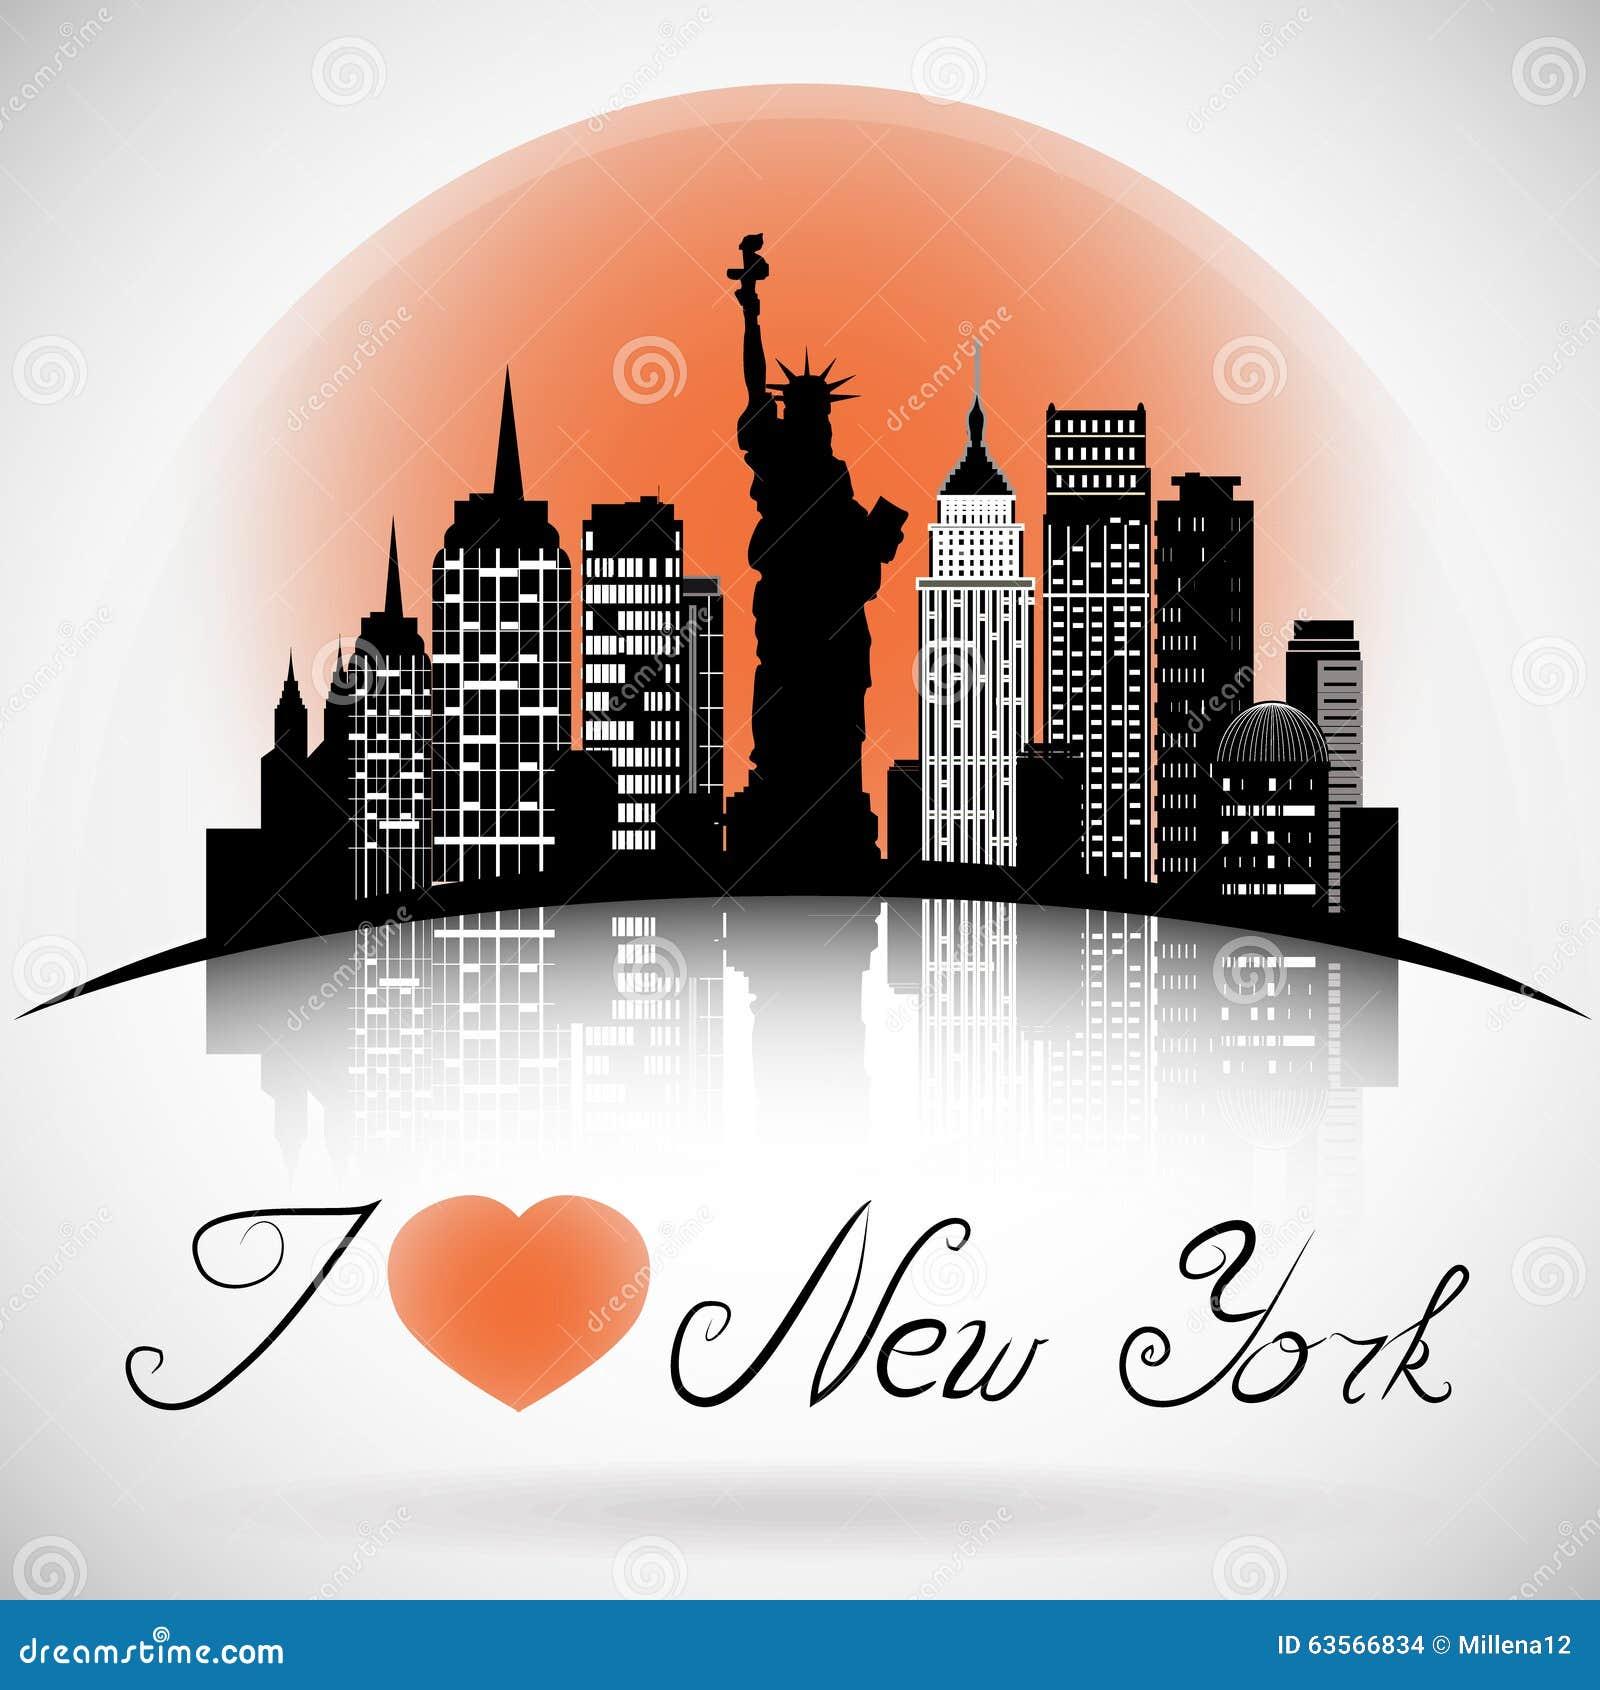 new york city skyline black and white illustration vector cartoon vector